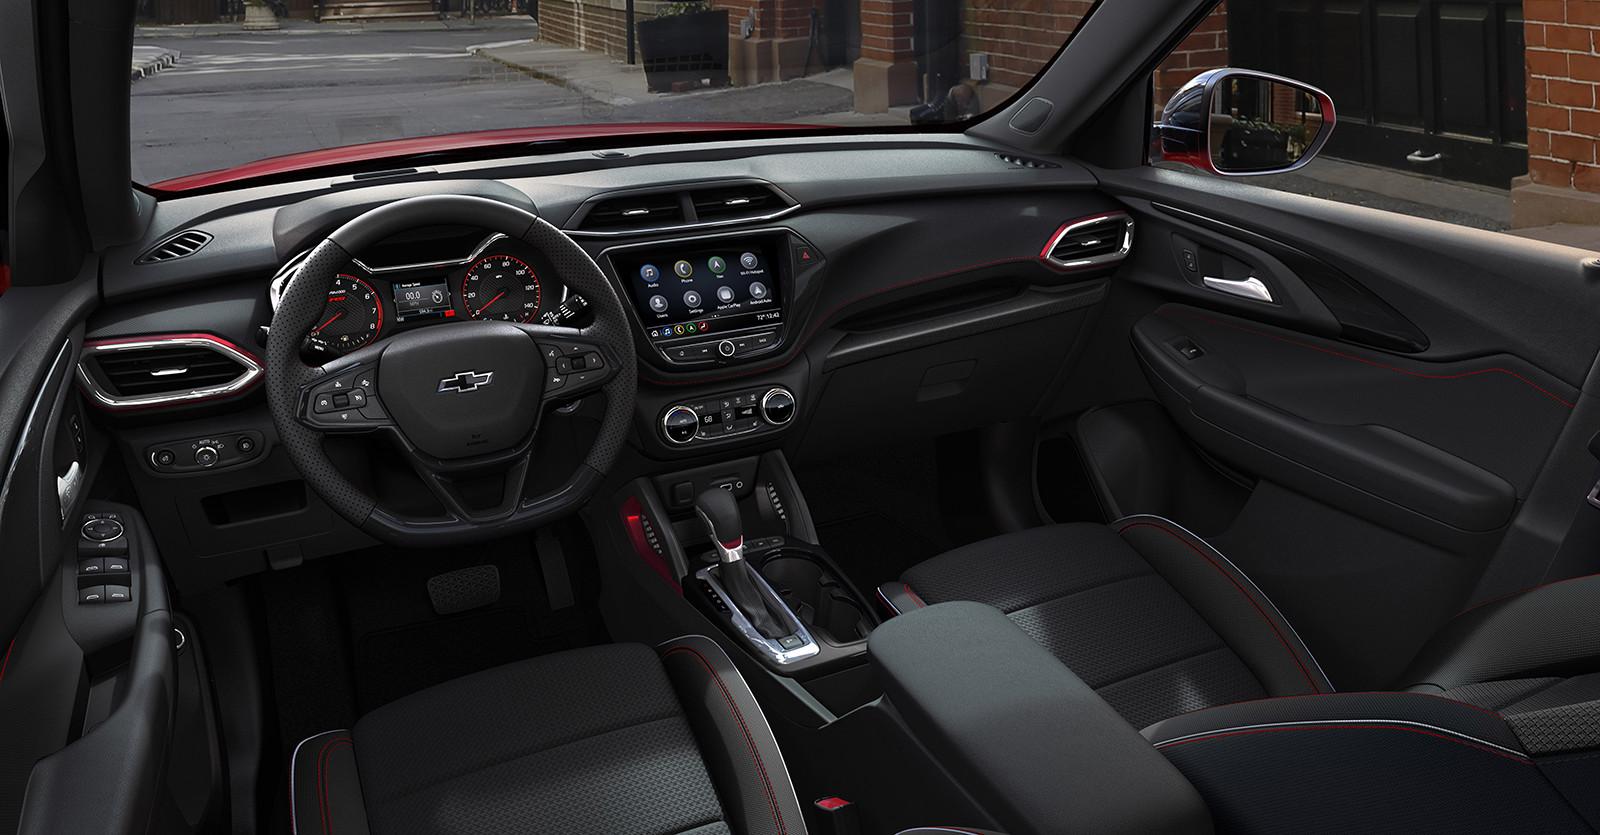 Foto de Chevrolet Trailblazer 2021 (22/26)